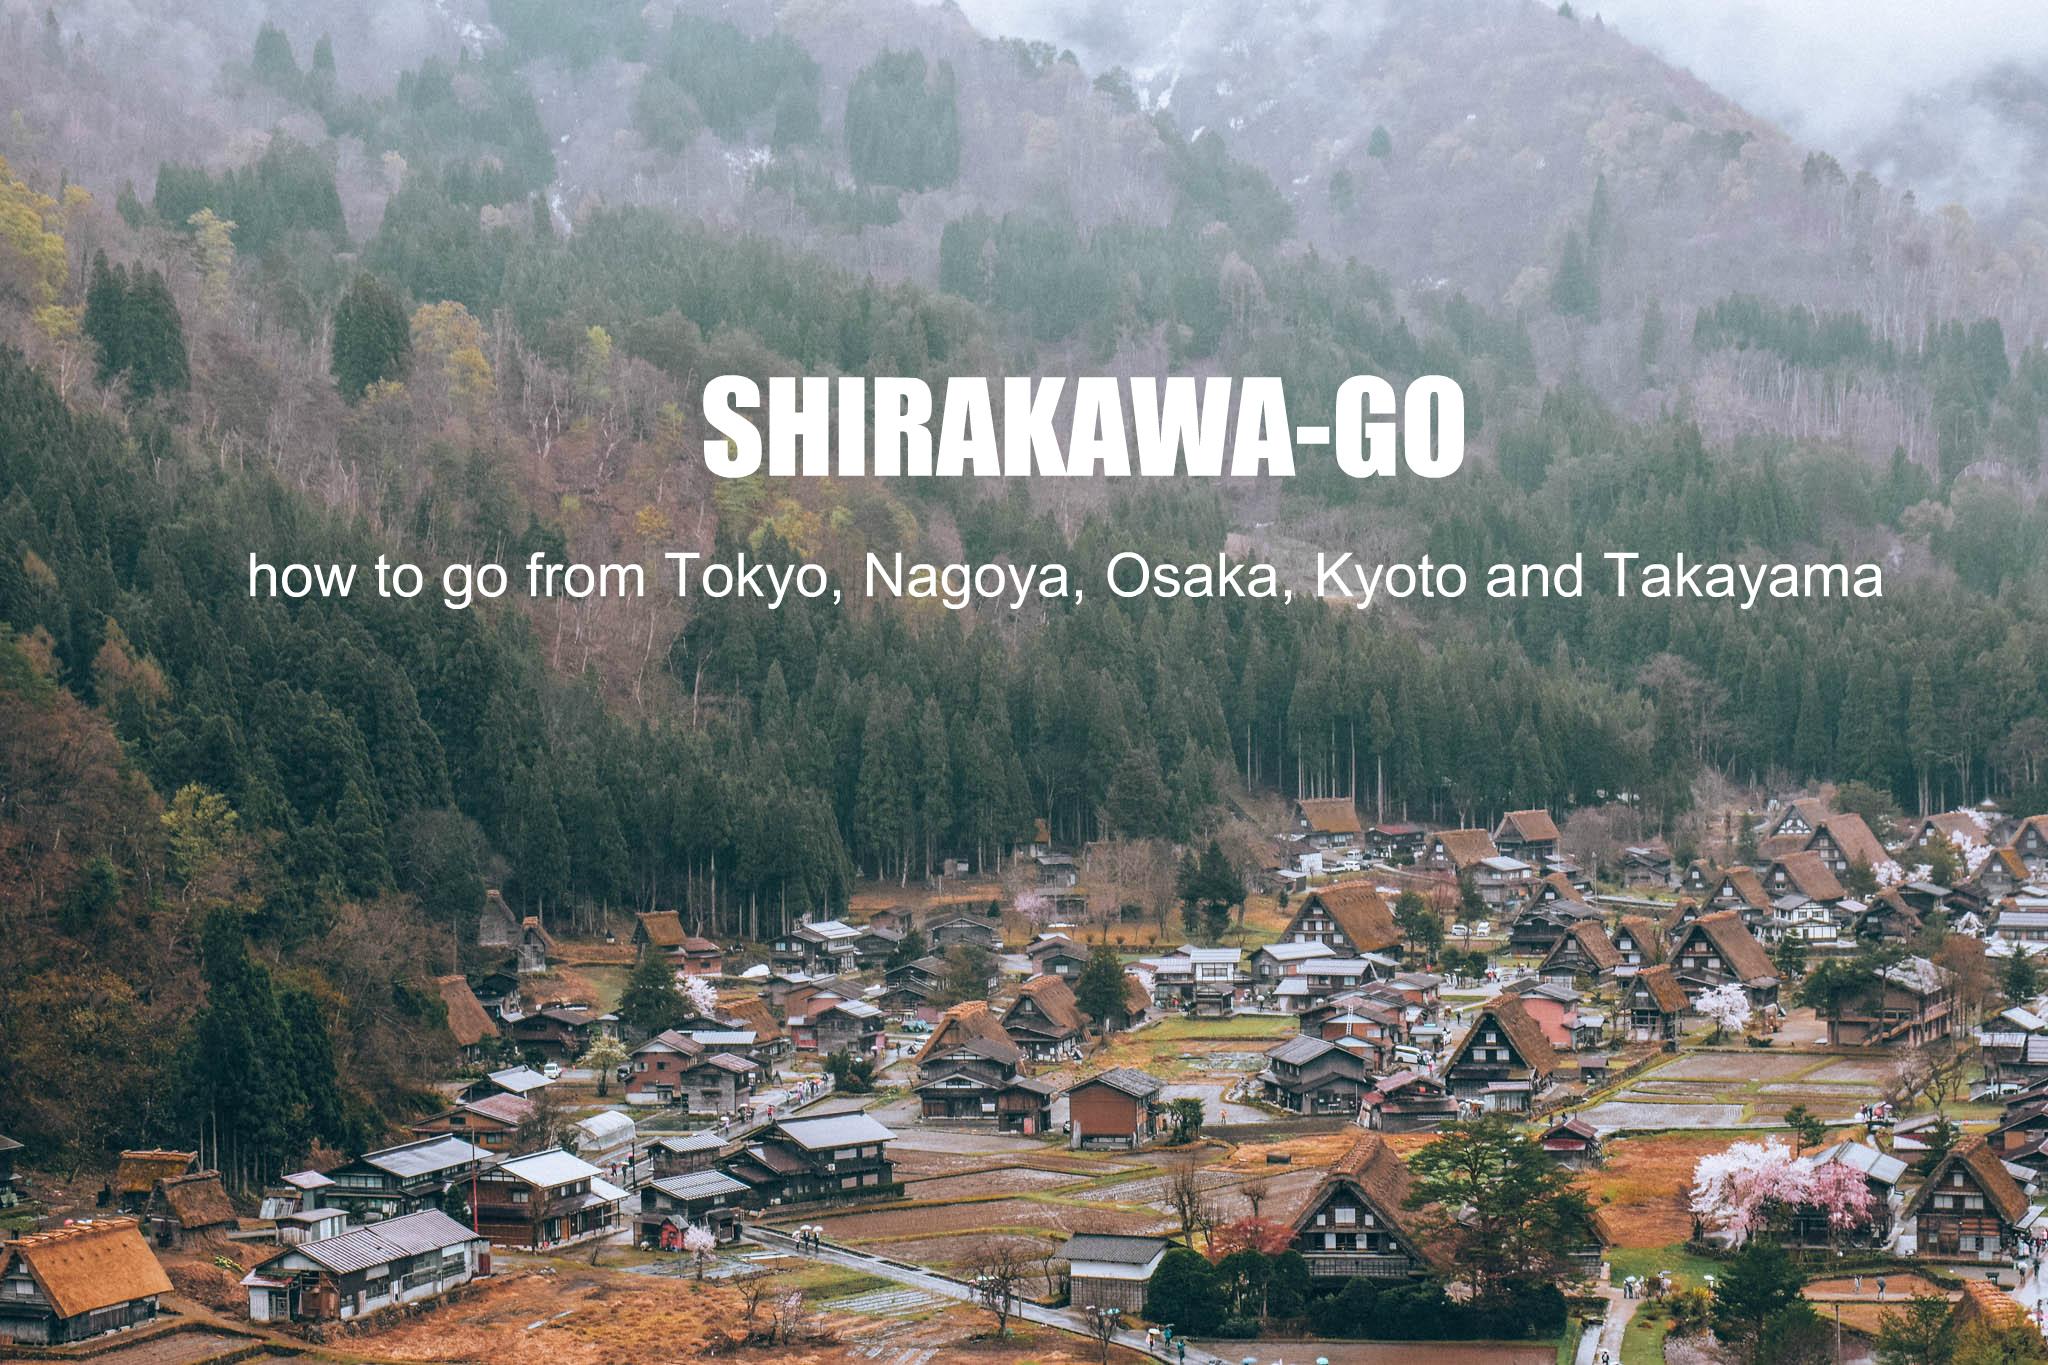 How to go to SHIRAKAWA-GO from Tokyo, Nagoya, Osaka, Kyoto and Takayama